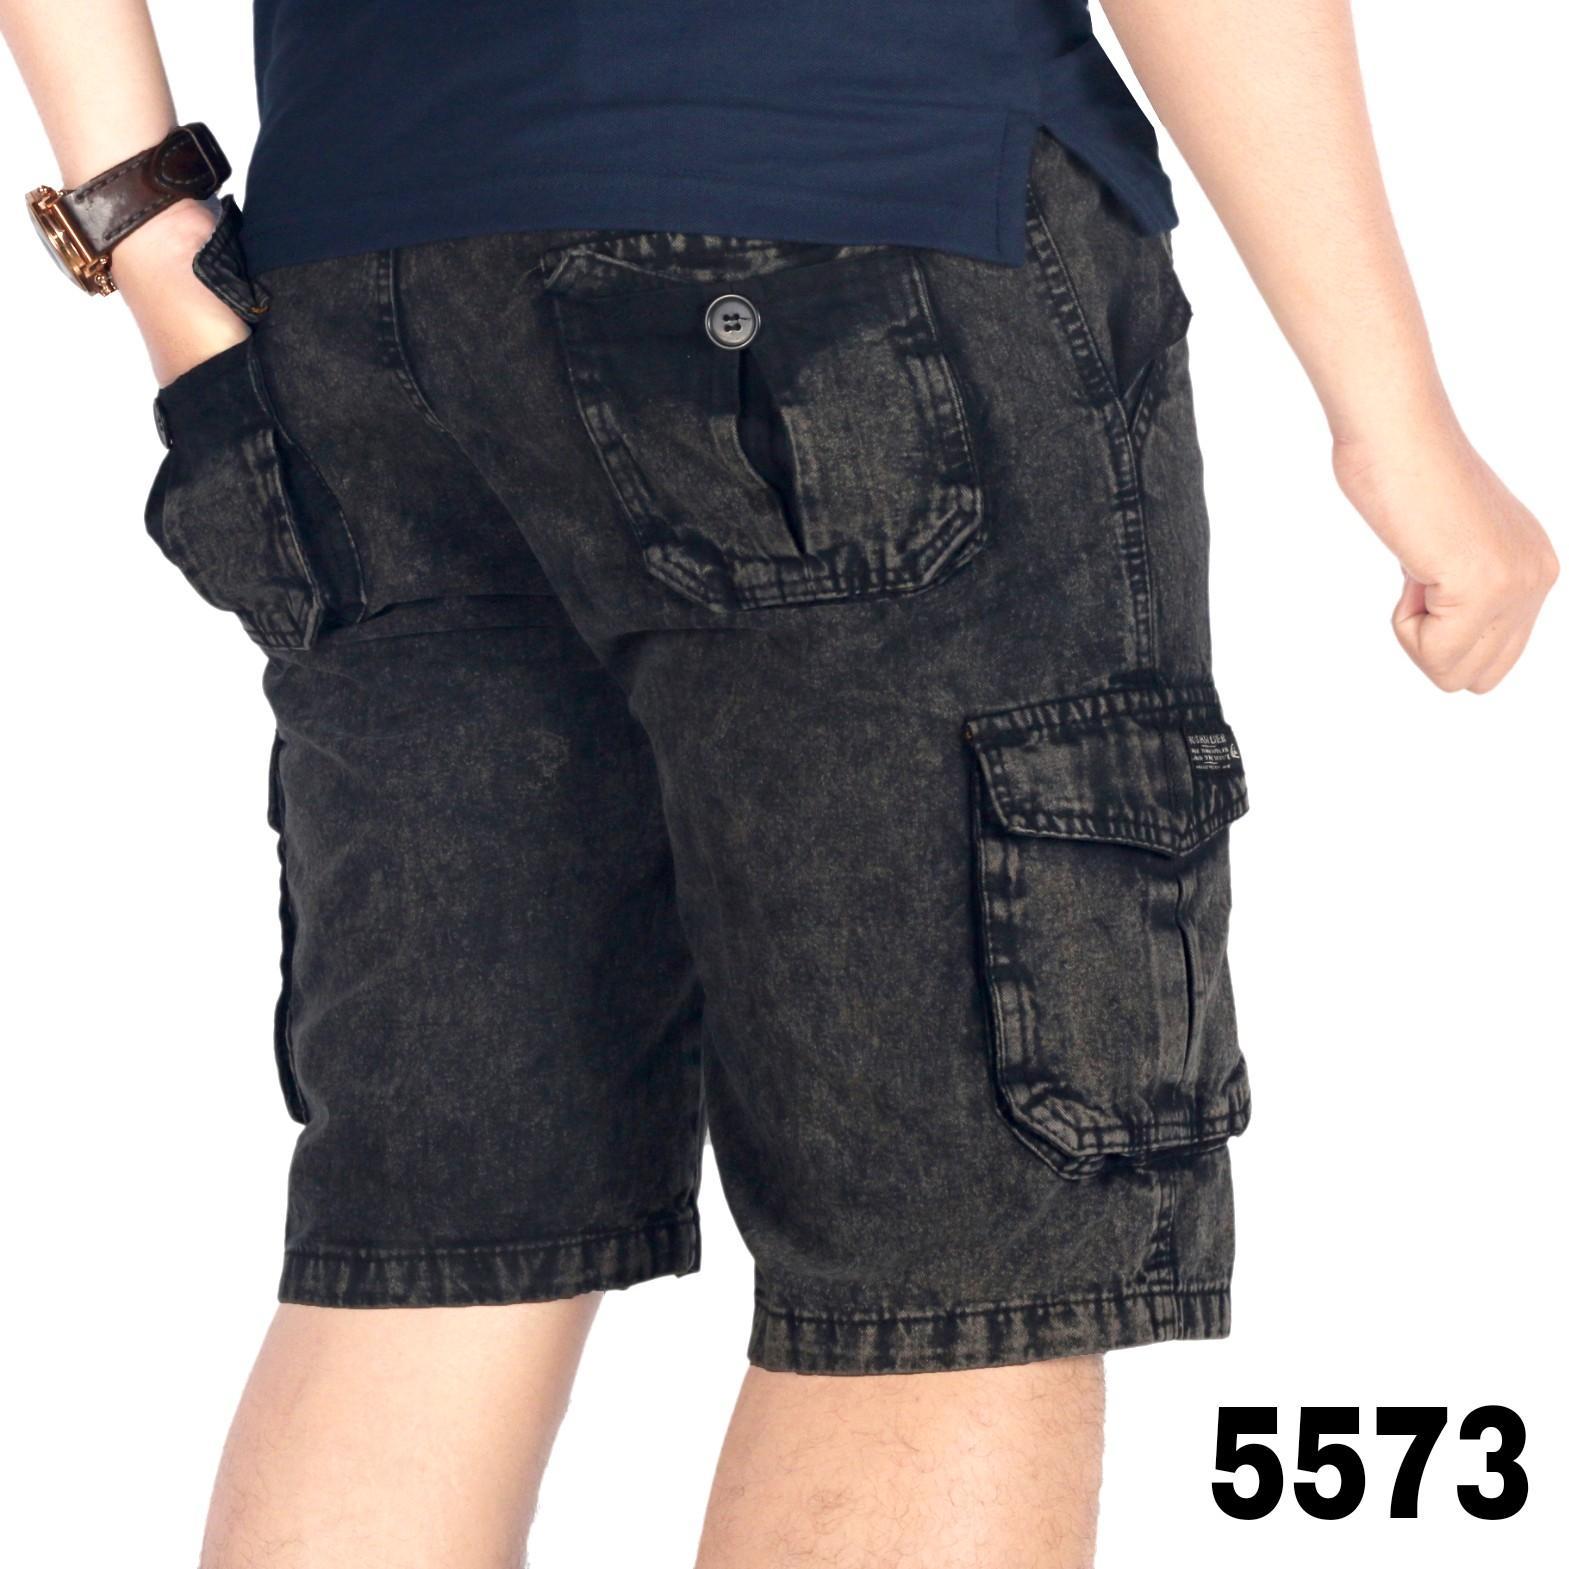 Bsg_Fashion1 Celana Pendek Hitam Polos Distro / Celana Skinny/Celana Pants/Celana Santai/Celana Casual/Celana Motif/Celana Polos/Celana Pria/Celana Cino/Celana Pantai/Celana Denim/Celana Jeans / CELANA JEANS KARGO /CELANA KARGO AN 5573 5574 5576 5575 - 5